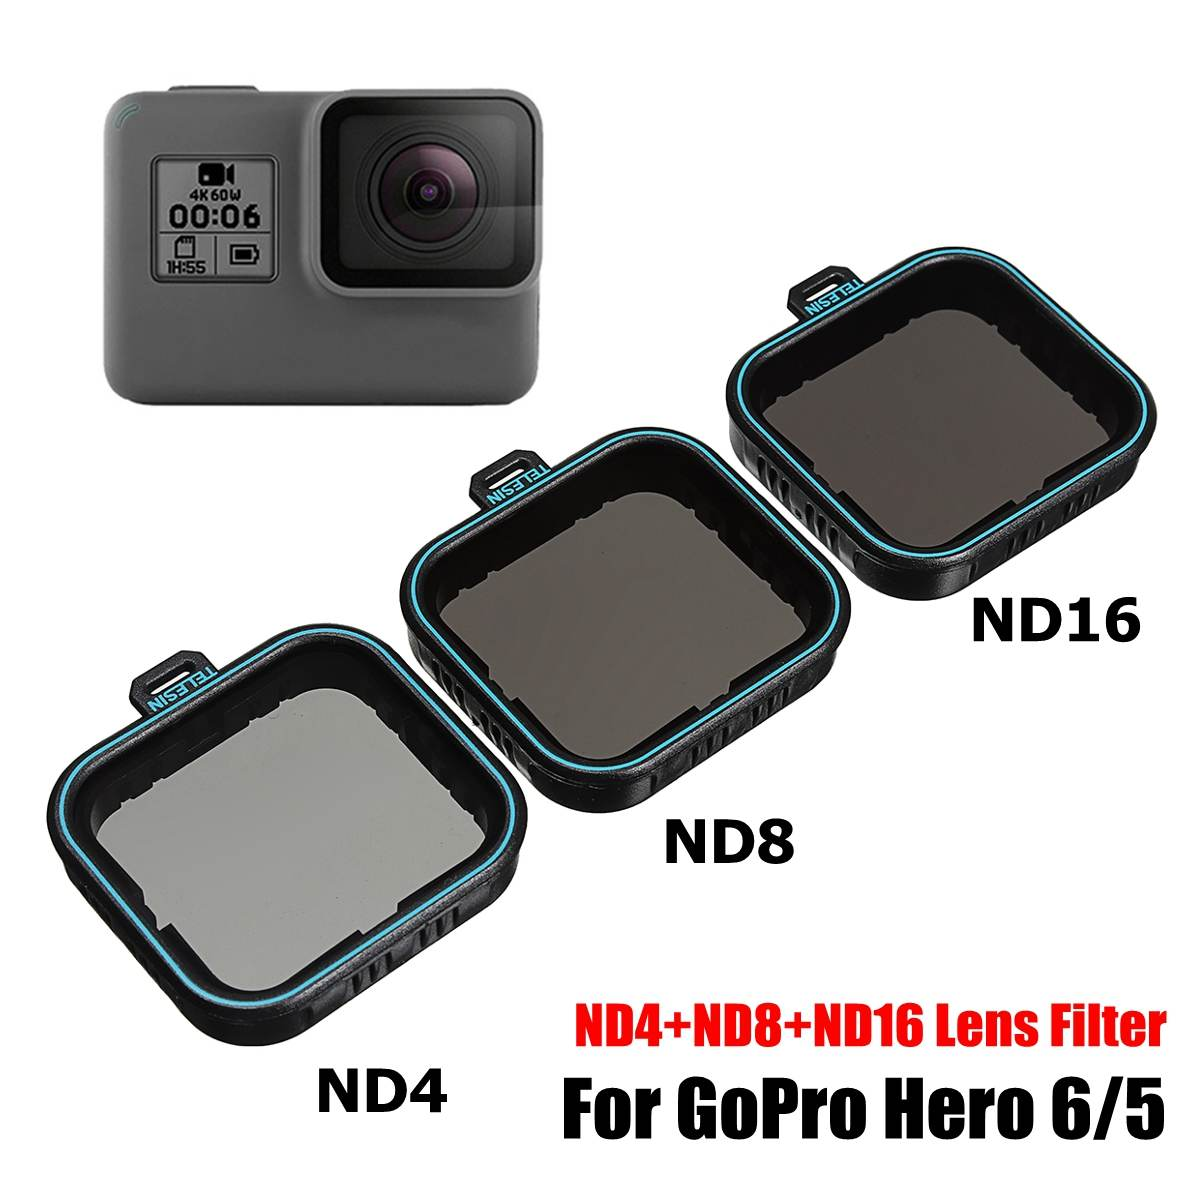 3 pacote Fiter Conjunto Protetor de Lente Filtro ND (ND4 8 16) + CPL Filtro para Gopro Hero Hero 5 6 Preto Herói Câmera 7 Accessoreis